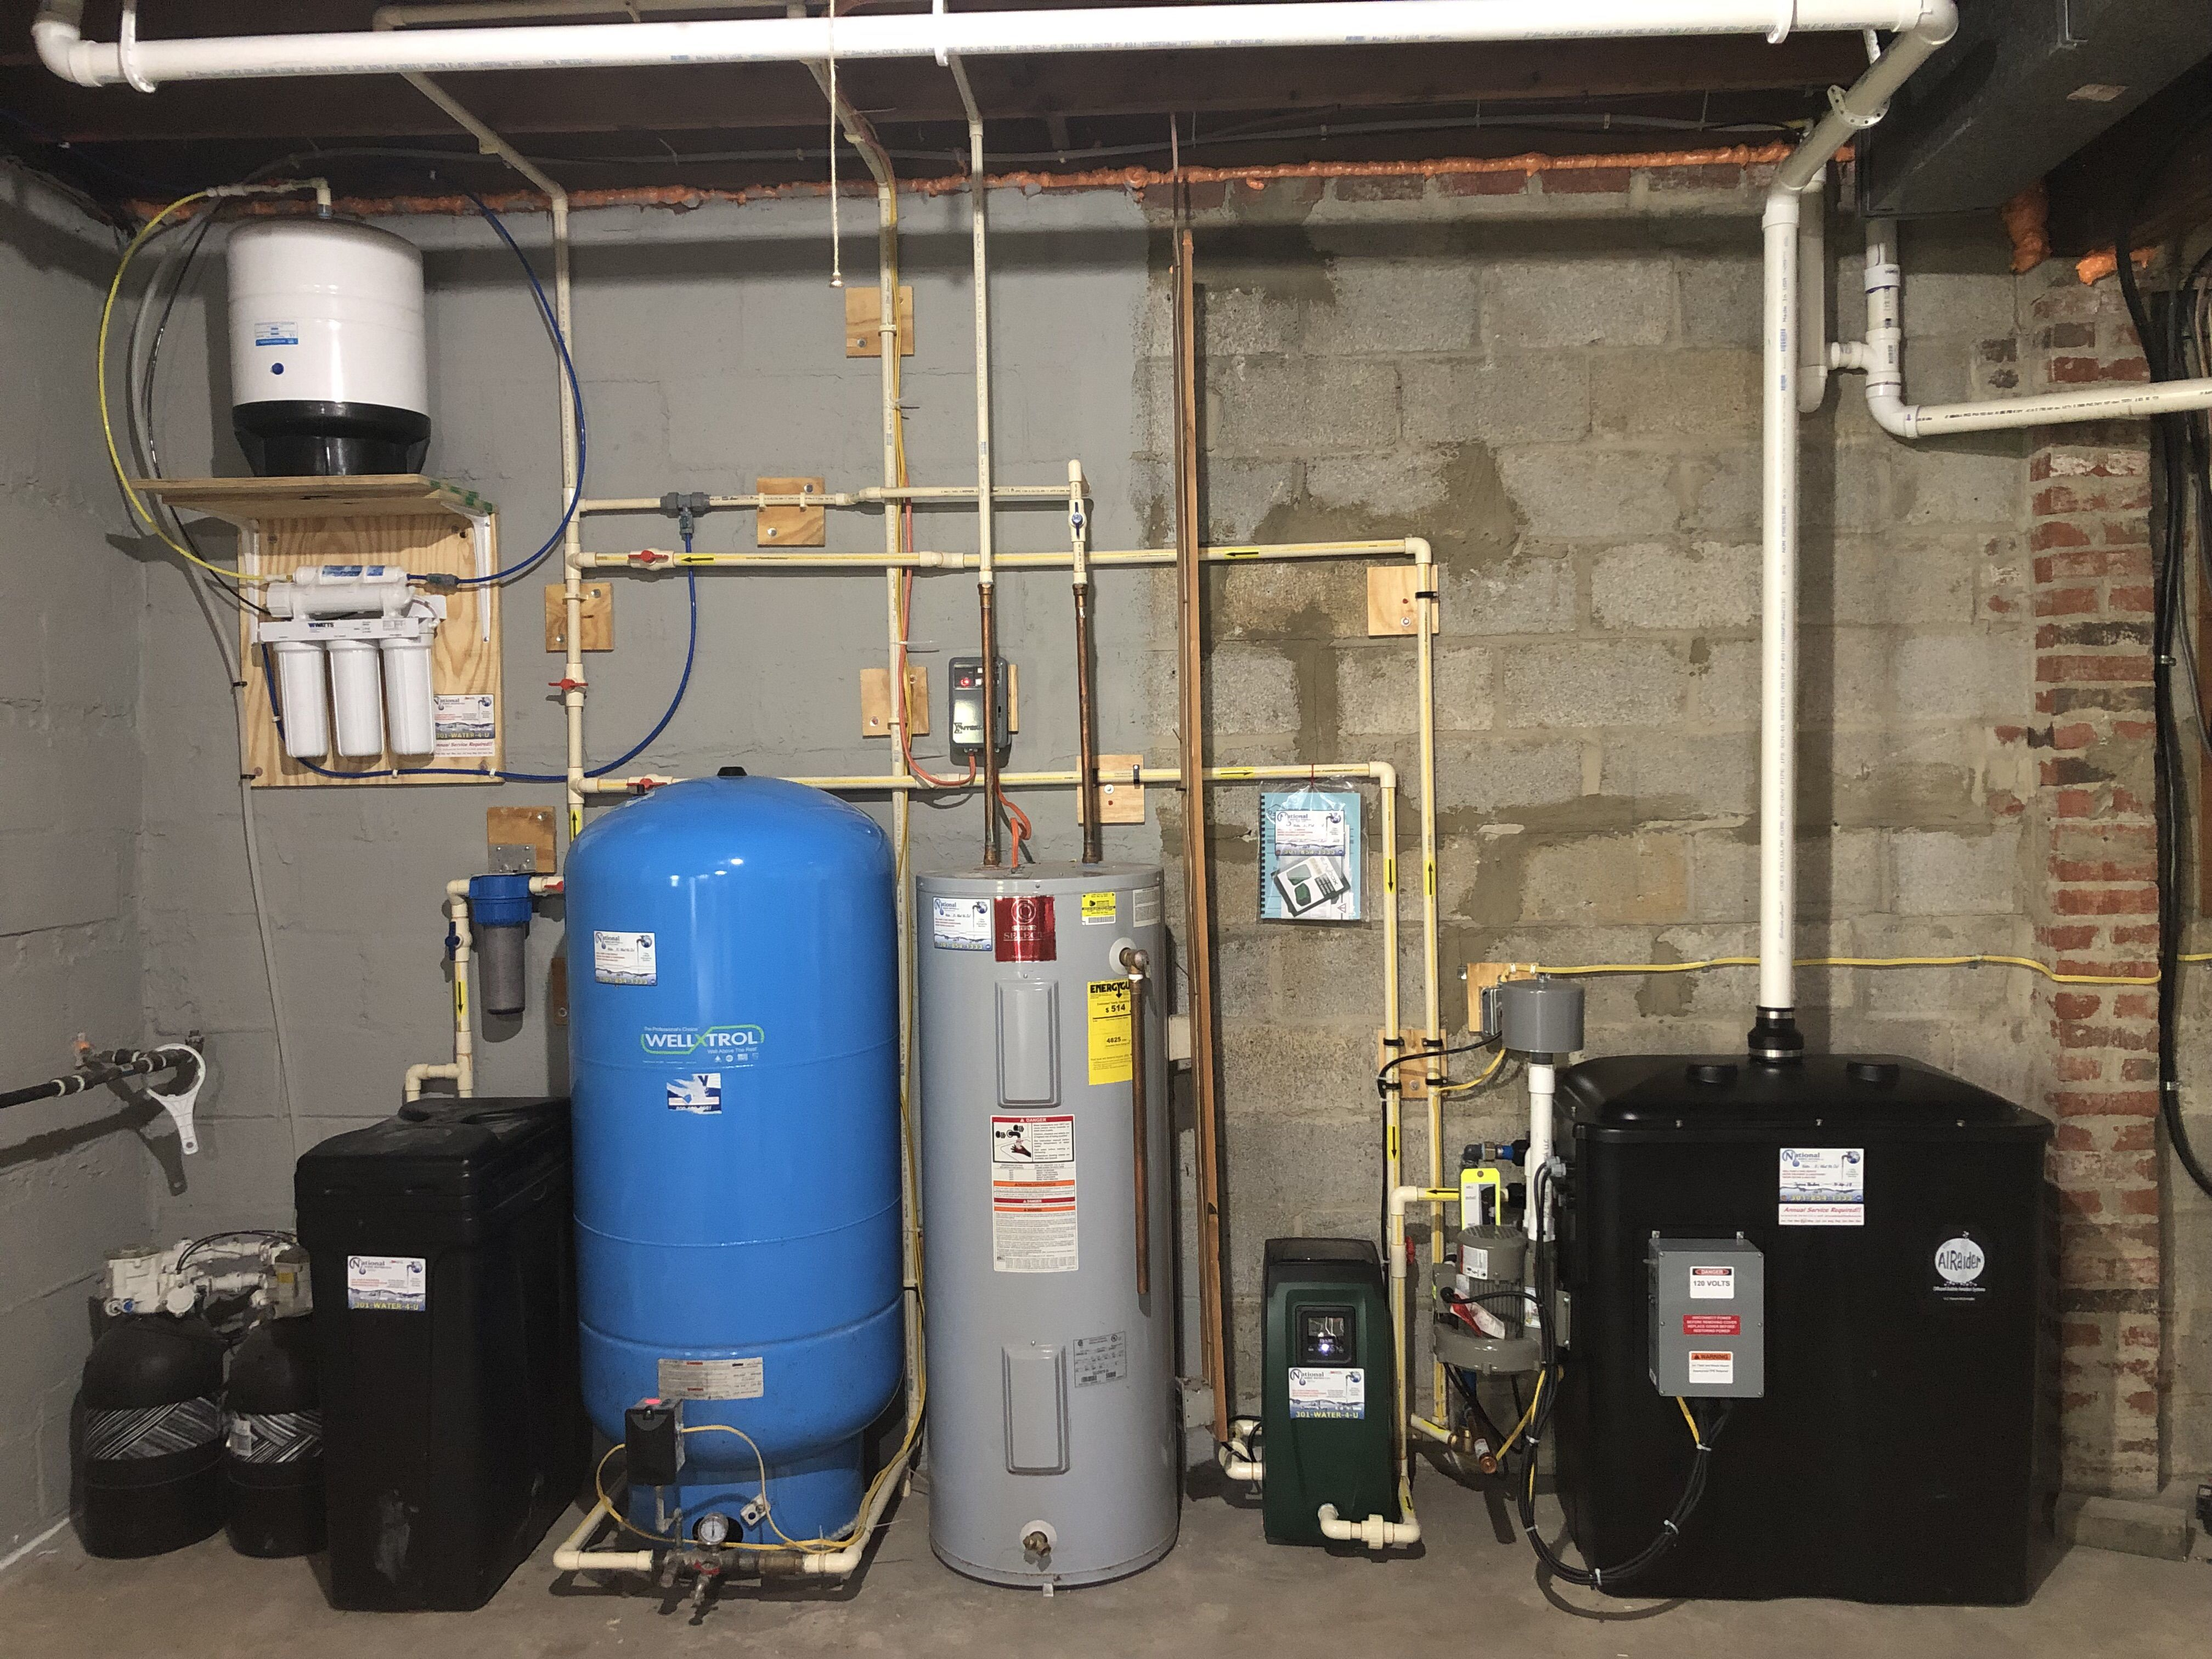 Radon Remediation Water Softener Sediment Filtration Water Heater Pressure Tank In 2020 Water Softener Water Treatment Water Heater